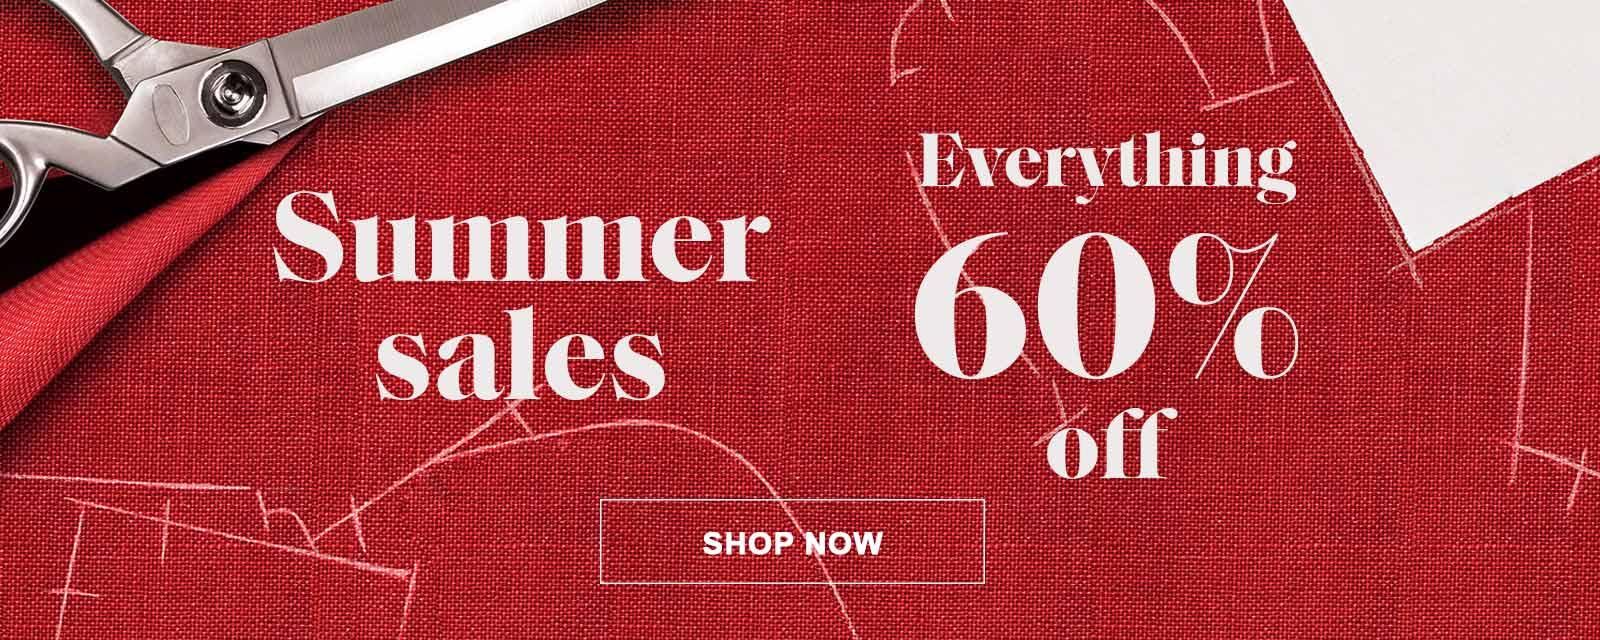 Elena Mirò Online Store - Curvy women\'s apparel - Official Website - ES